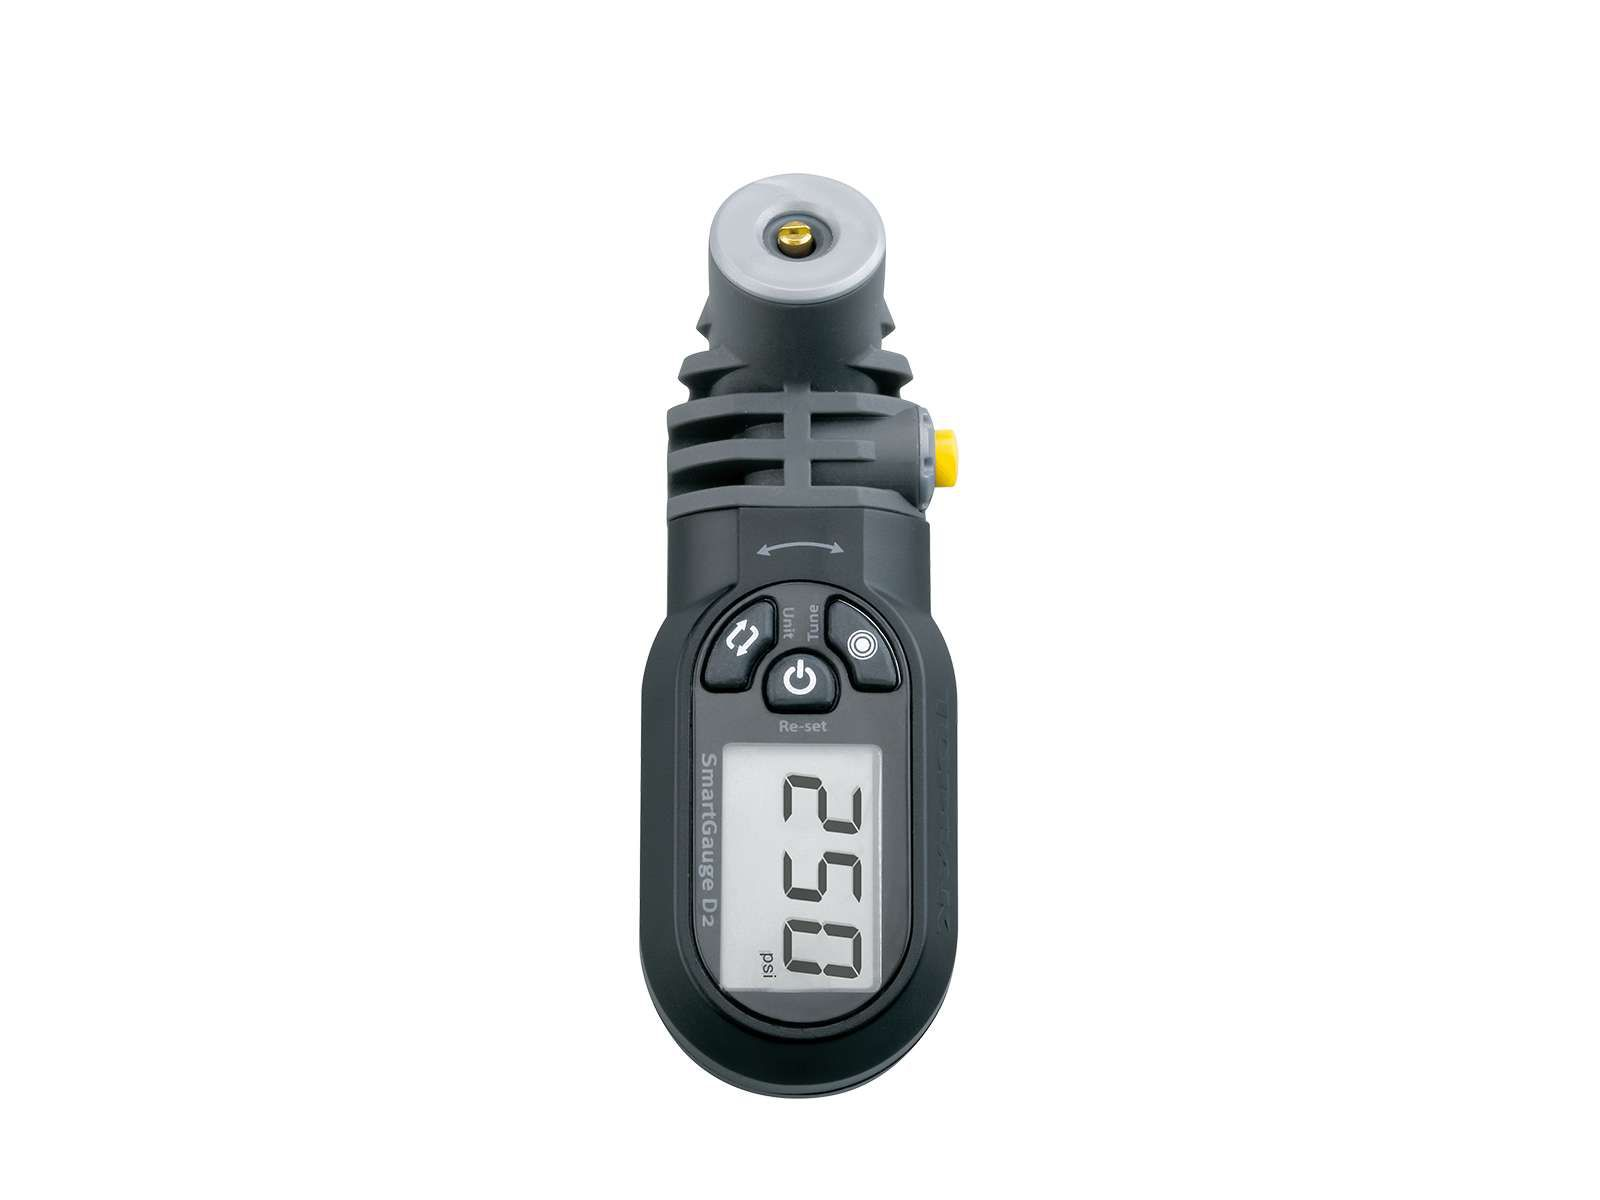 Medidor de Pressão - Topeak SmartGauge D2 - Digital